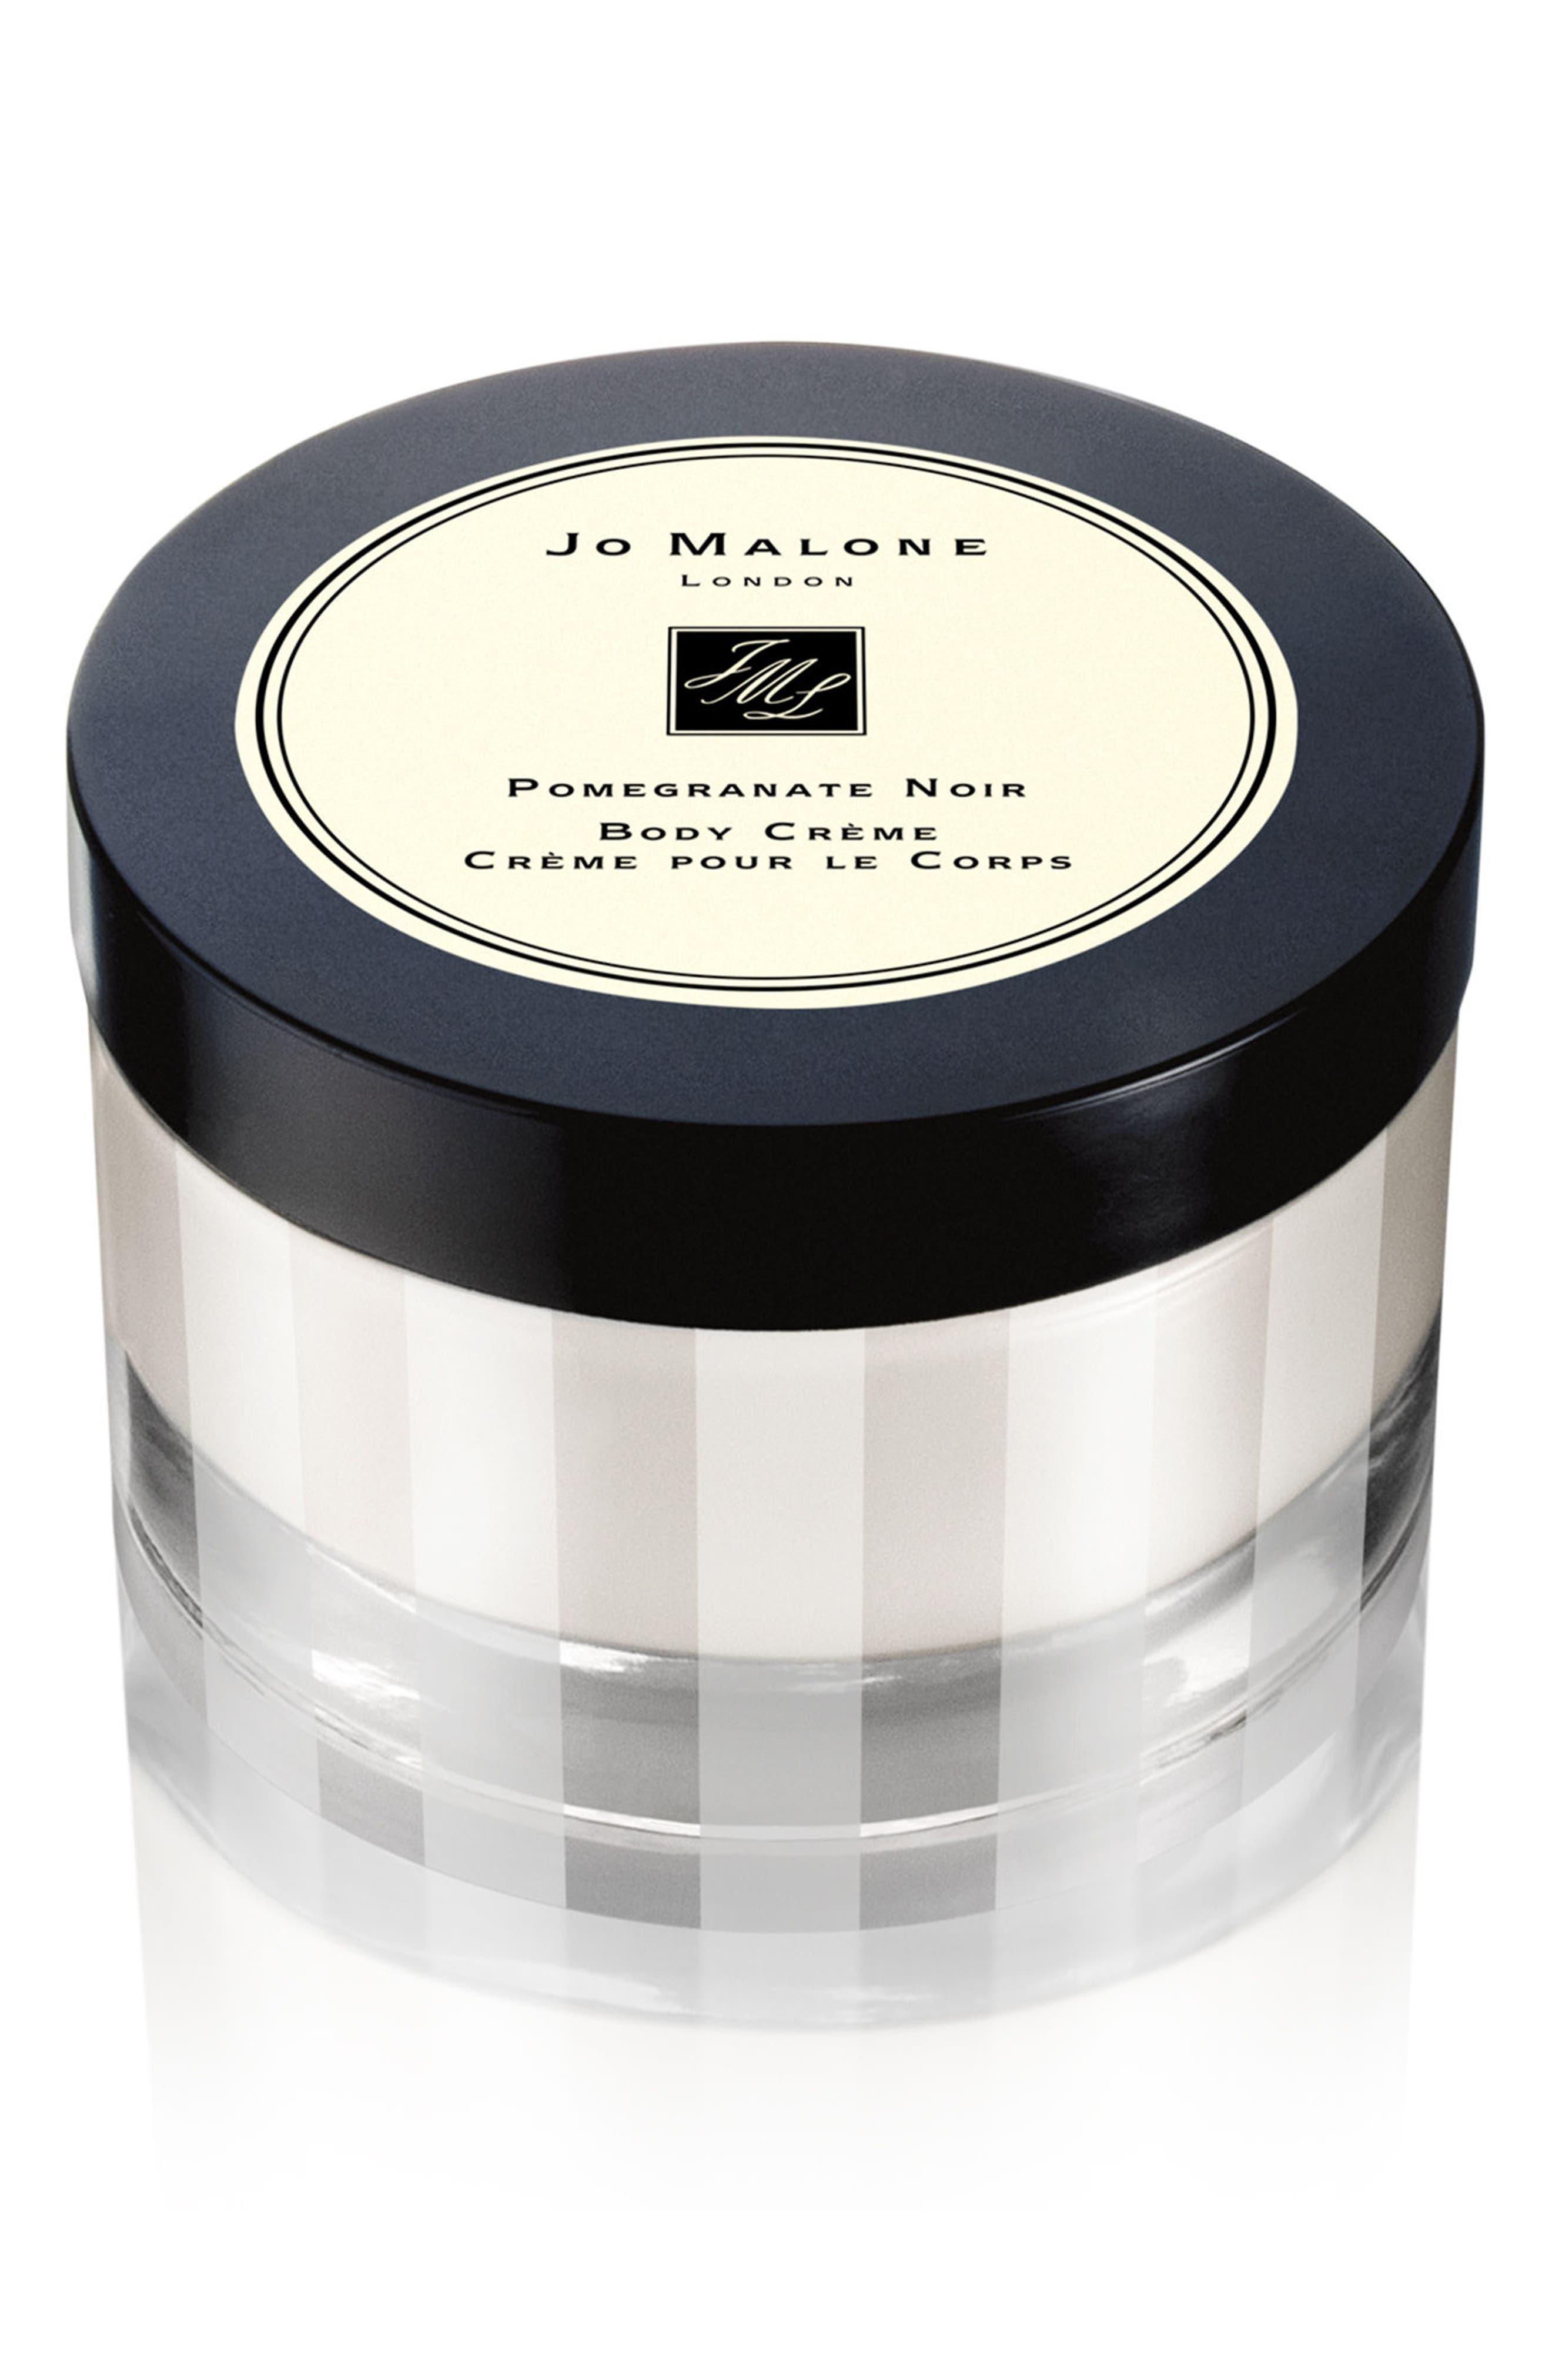 Jo Malone London(TM) Pomegranate Noir Body Creme